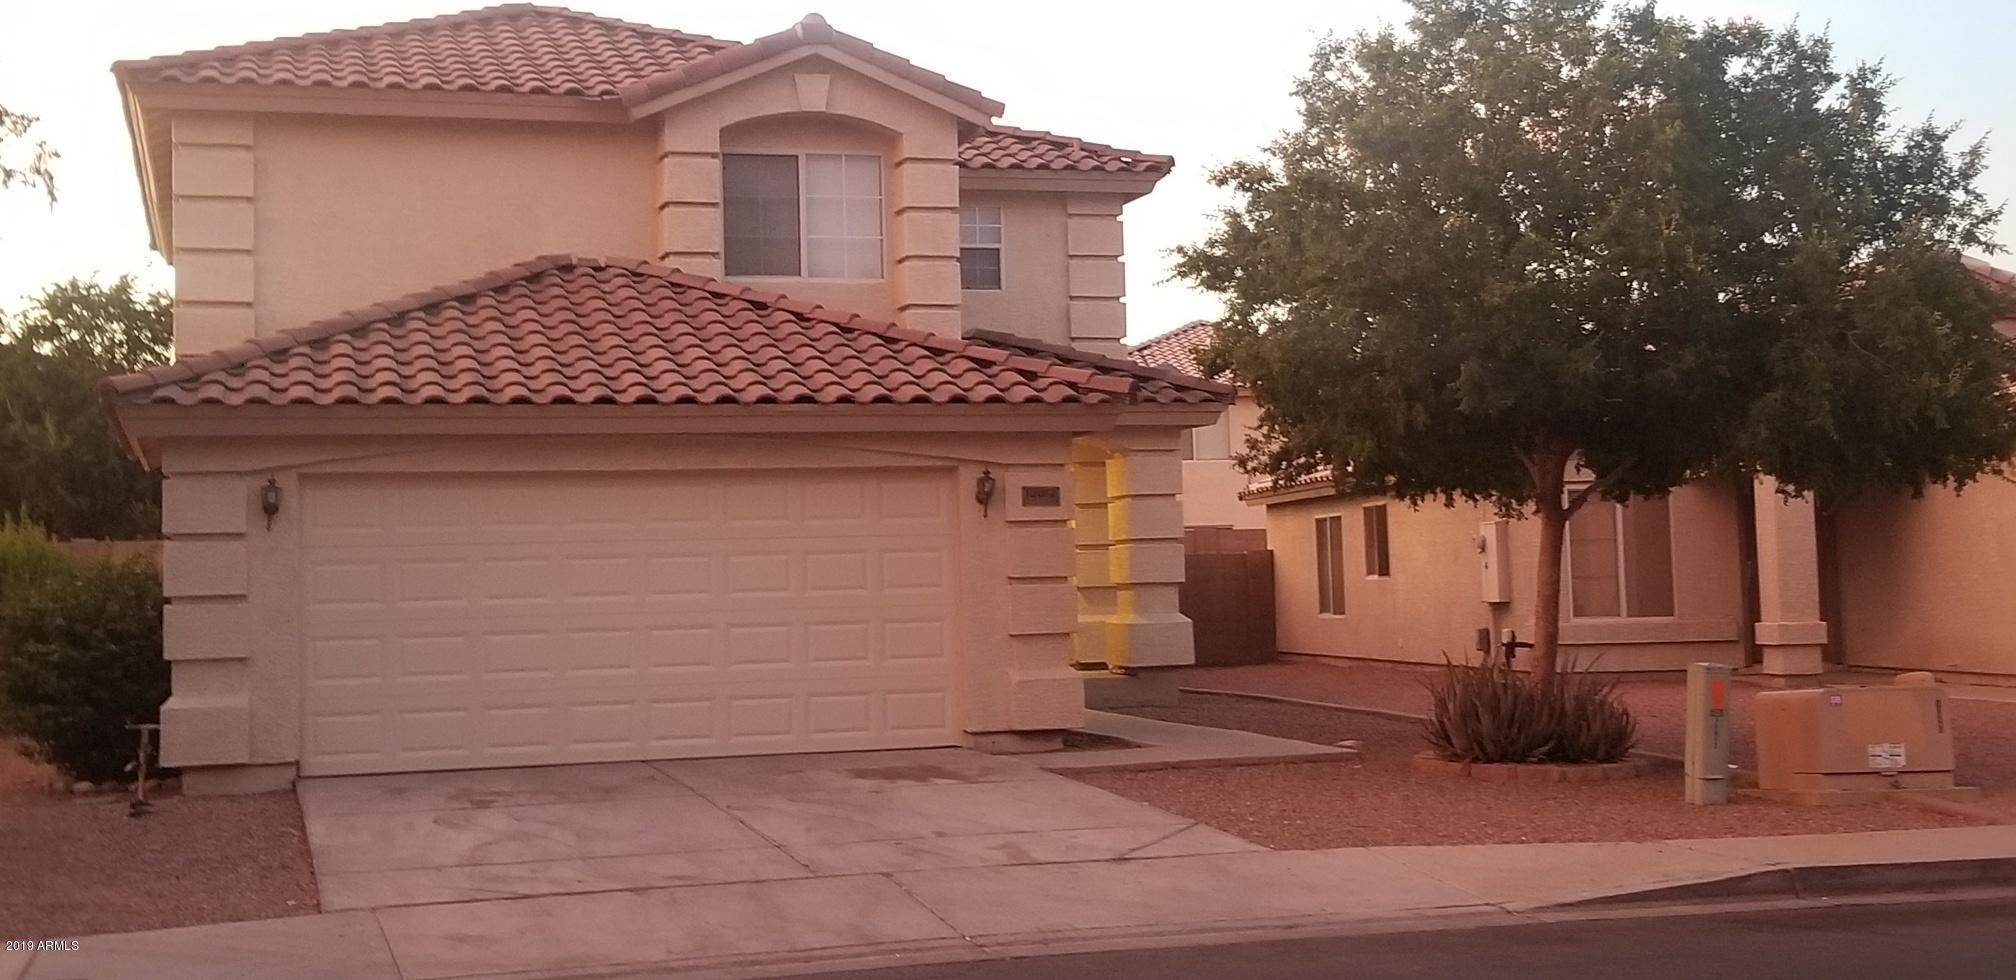 ROSEWOOD Drive, El Mirage, Arizona 85335, 3 Bedrooms Bedrooms, ,2.5 BathroomsBathrooms,Residential Rental,For Sale,ROSEWOOD,6139273